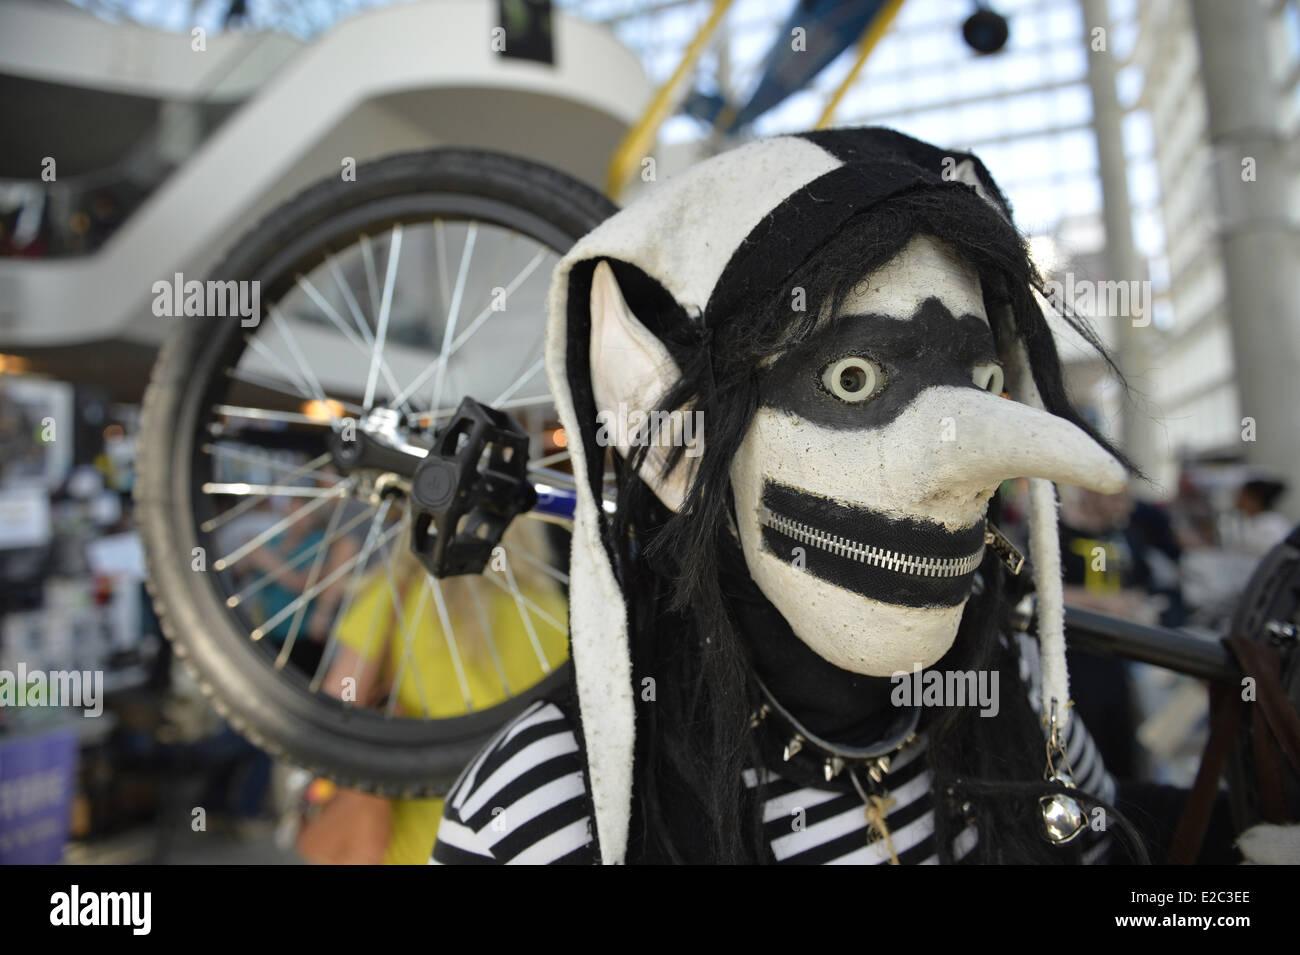 Garden City, New York, USA. 14th June, 2014. ZIPPY DEE THE WONDER DUMMY, from Long Island, has a mouth zipped shut Stock Photo